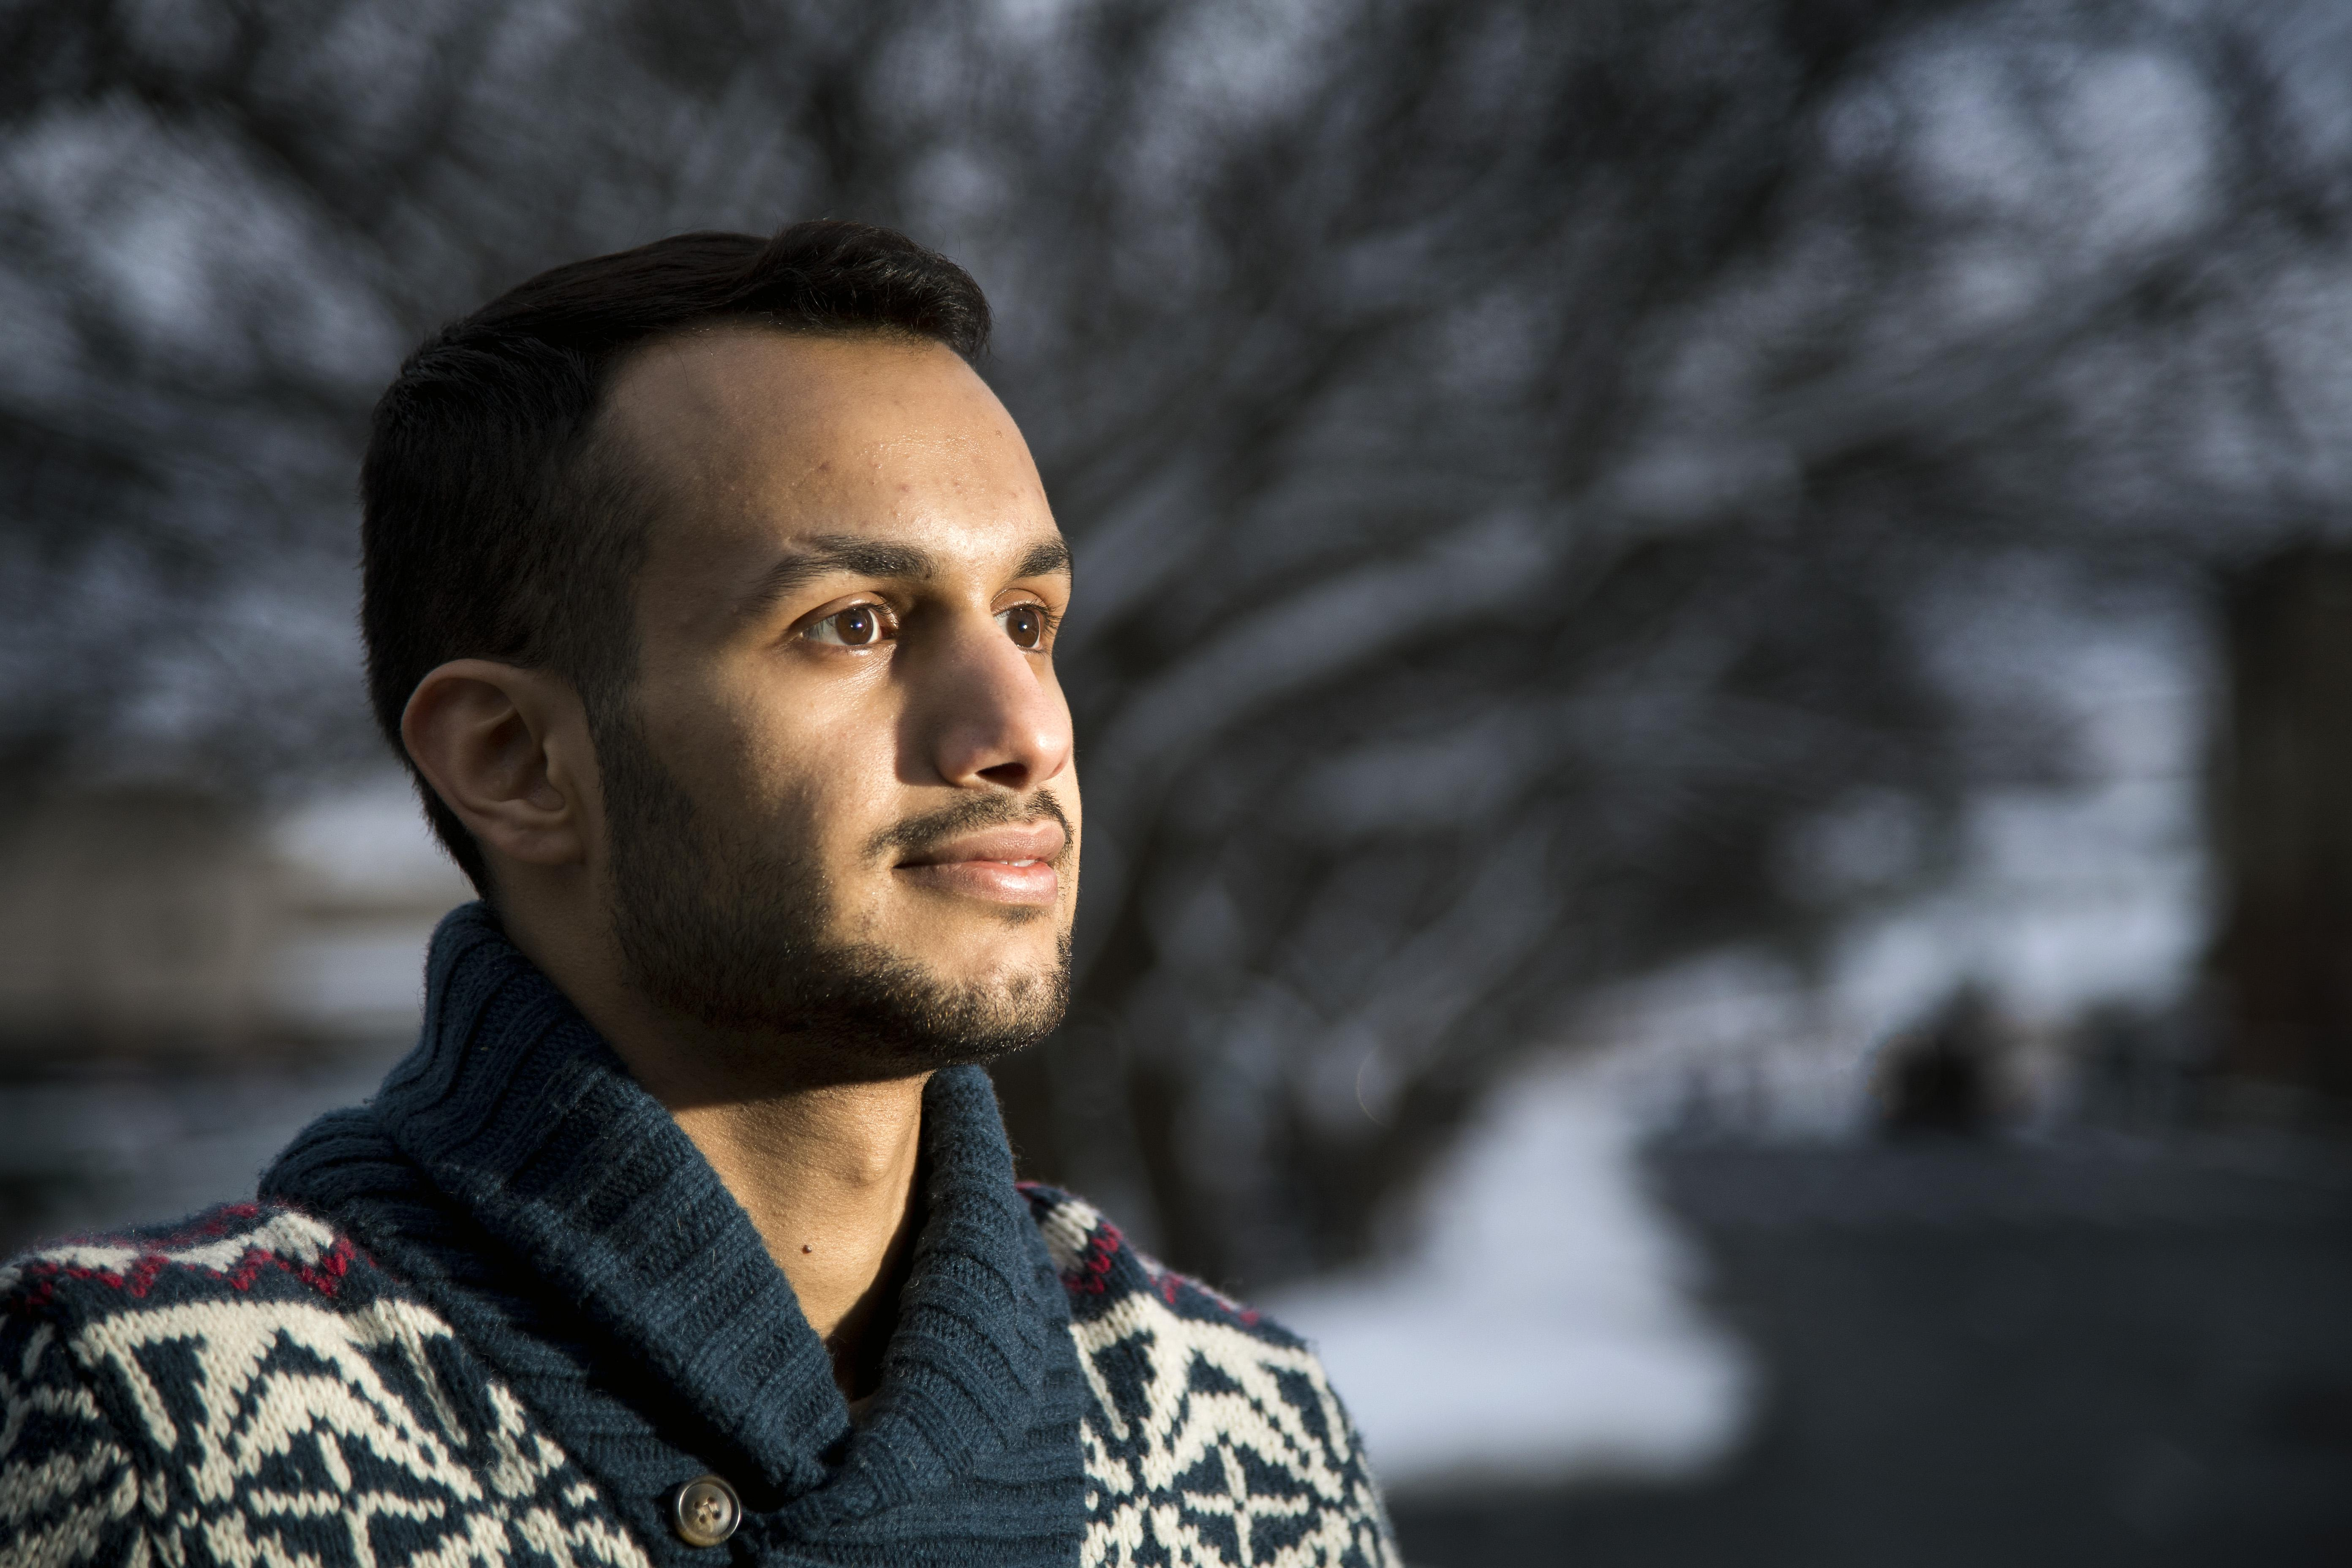 e8e4bcb2ce85 Yousef Almaliki is a Saudi Arabian national who is attending Eastern  Washington University on a student